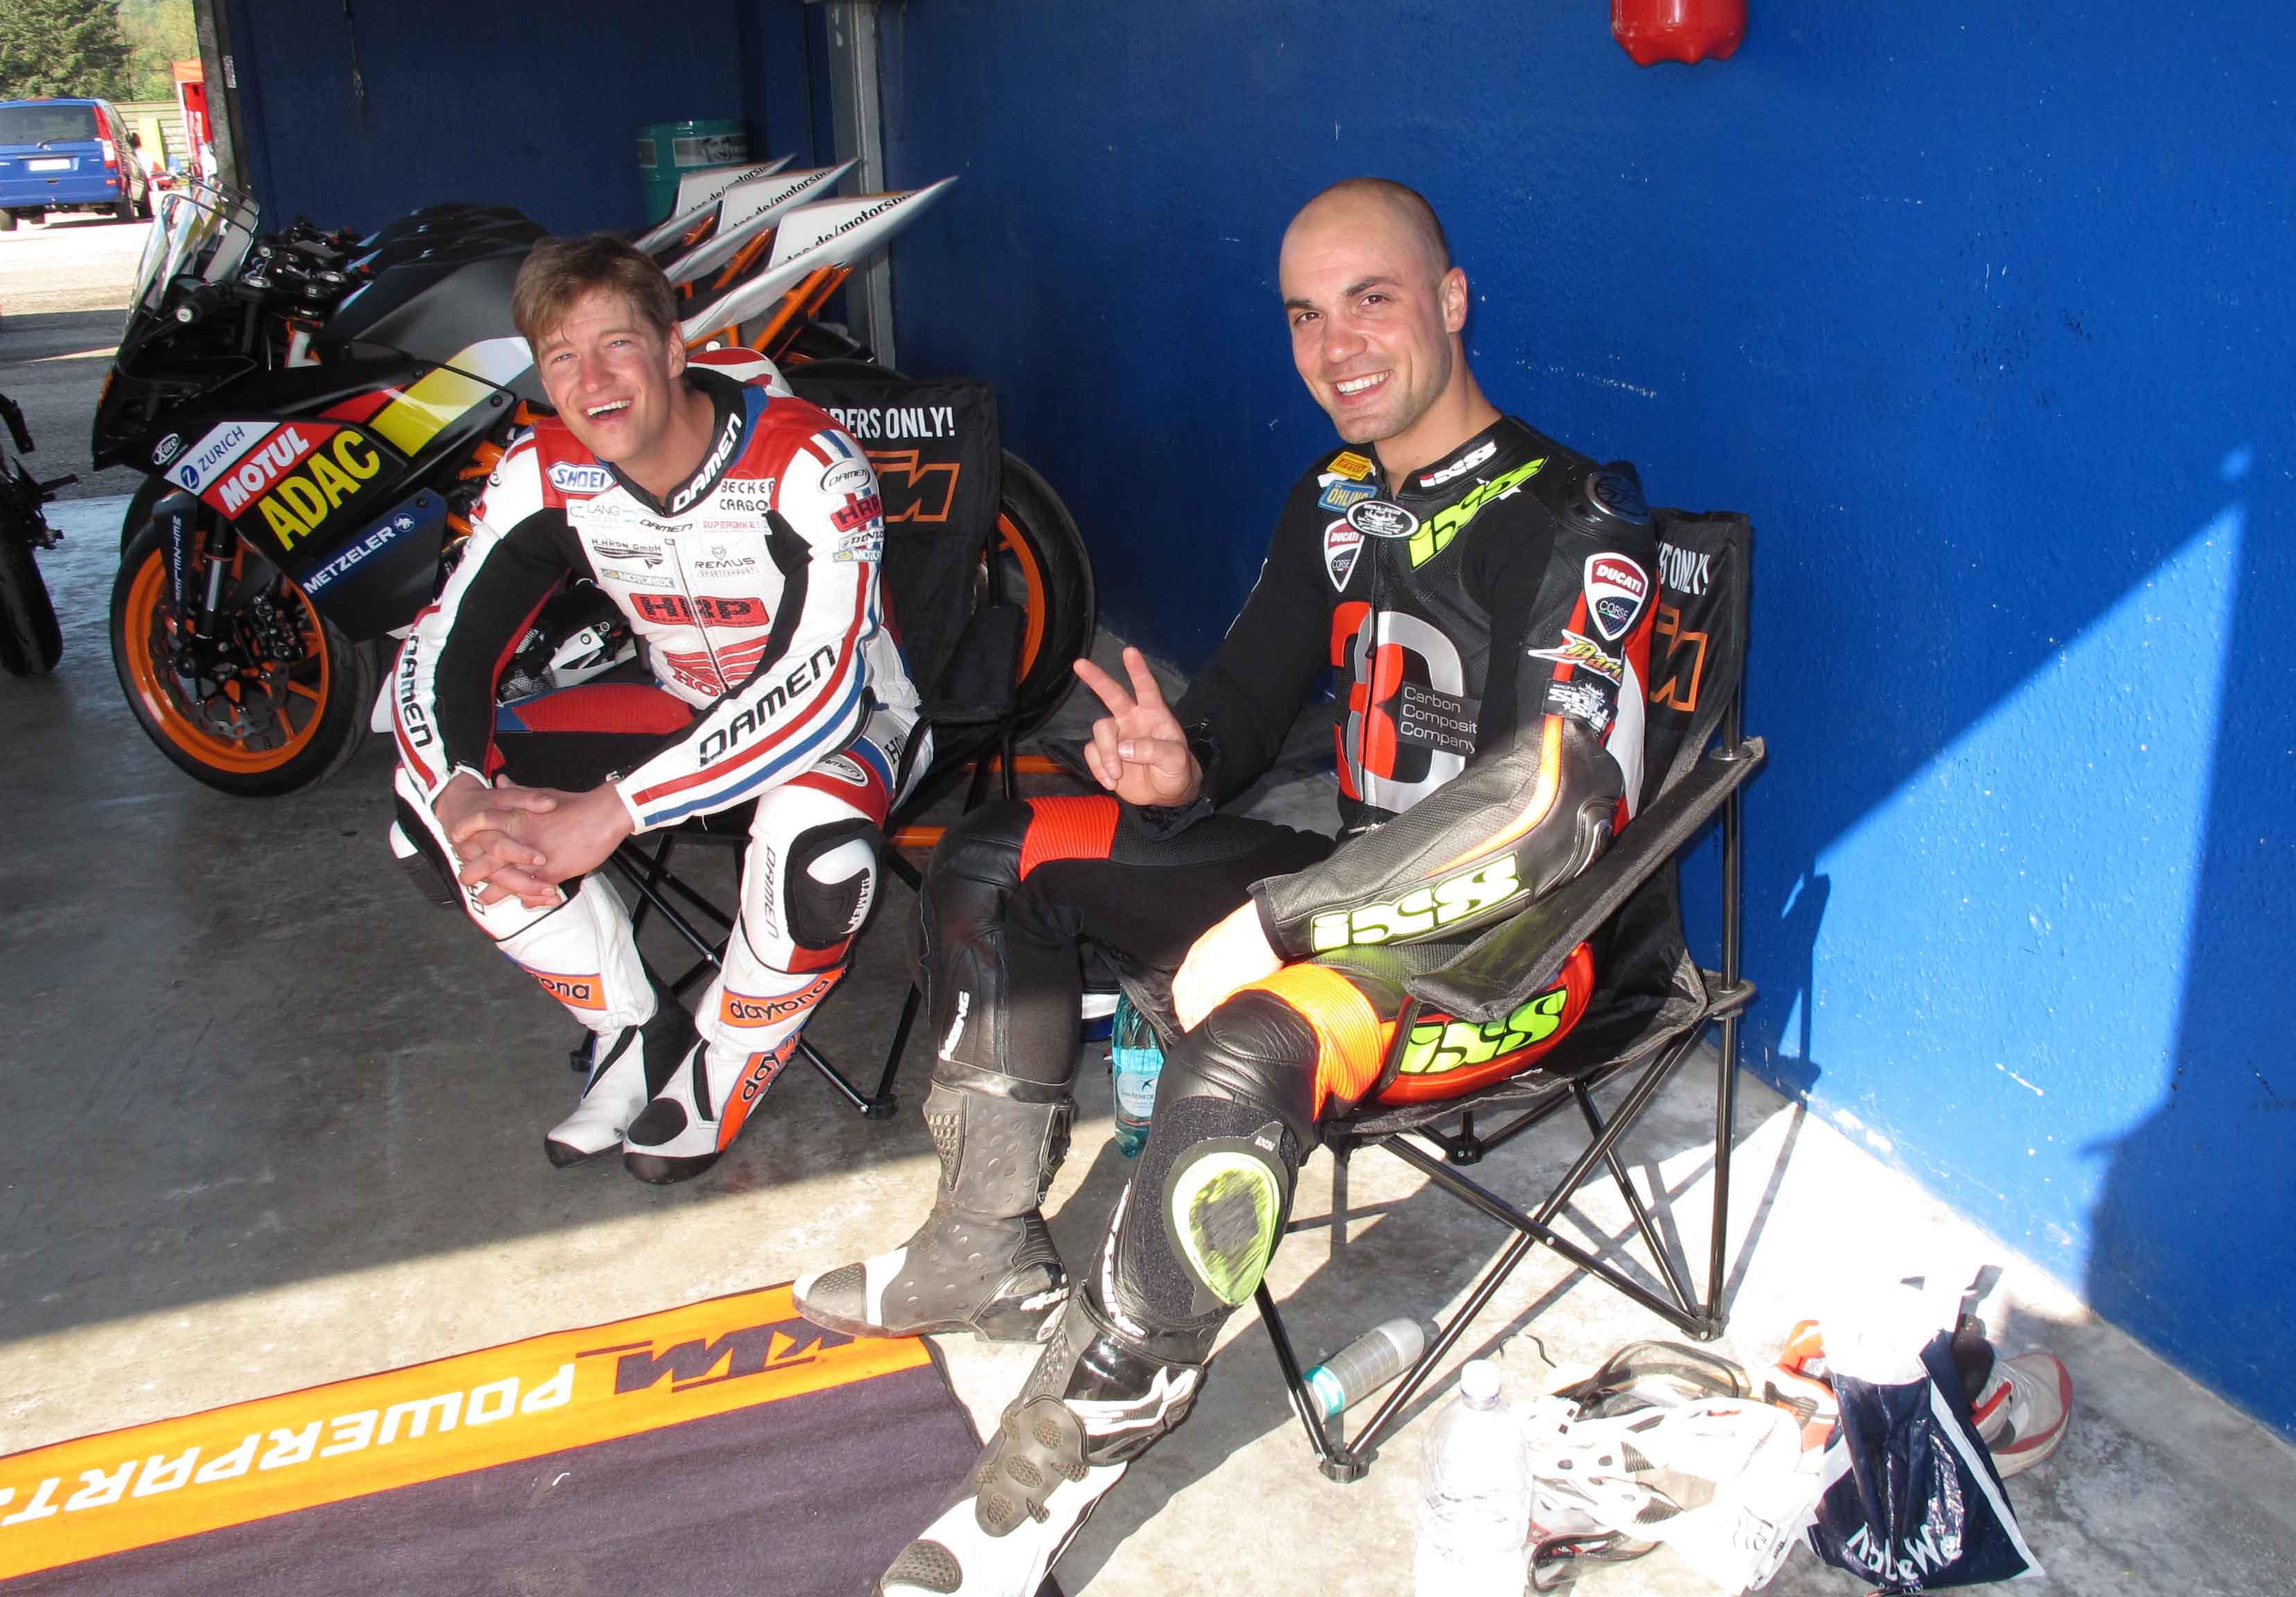 Dario Giuseppetti & Michael Ranseder